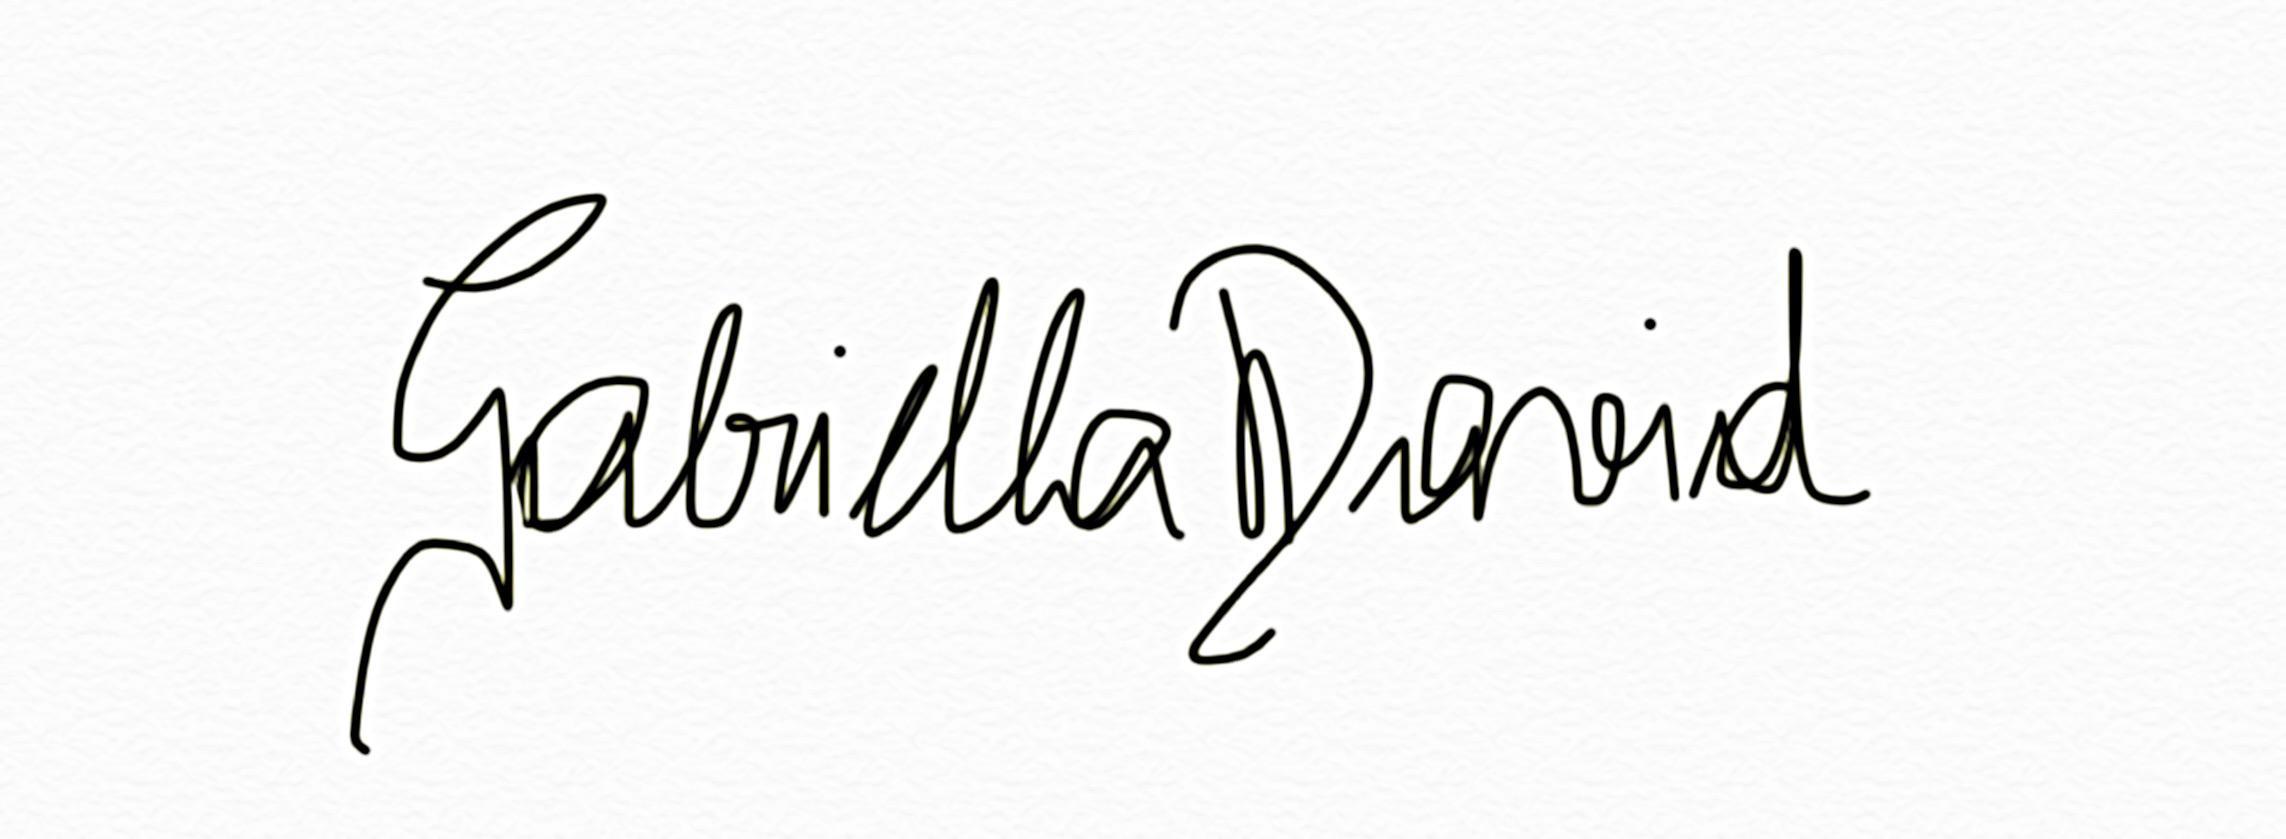 Gabriella David's Signature